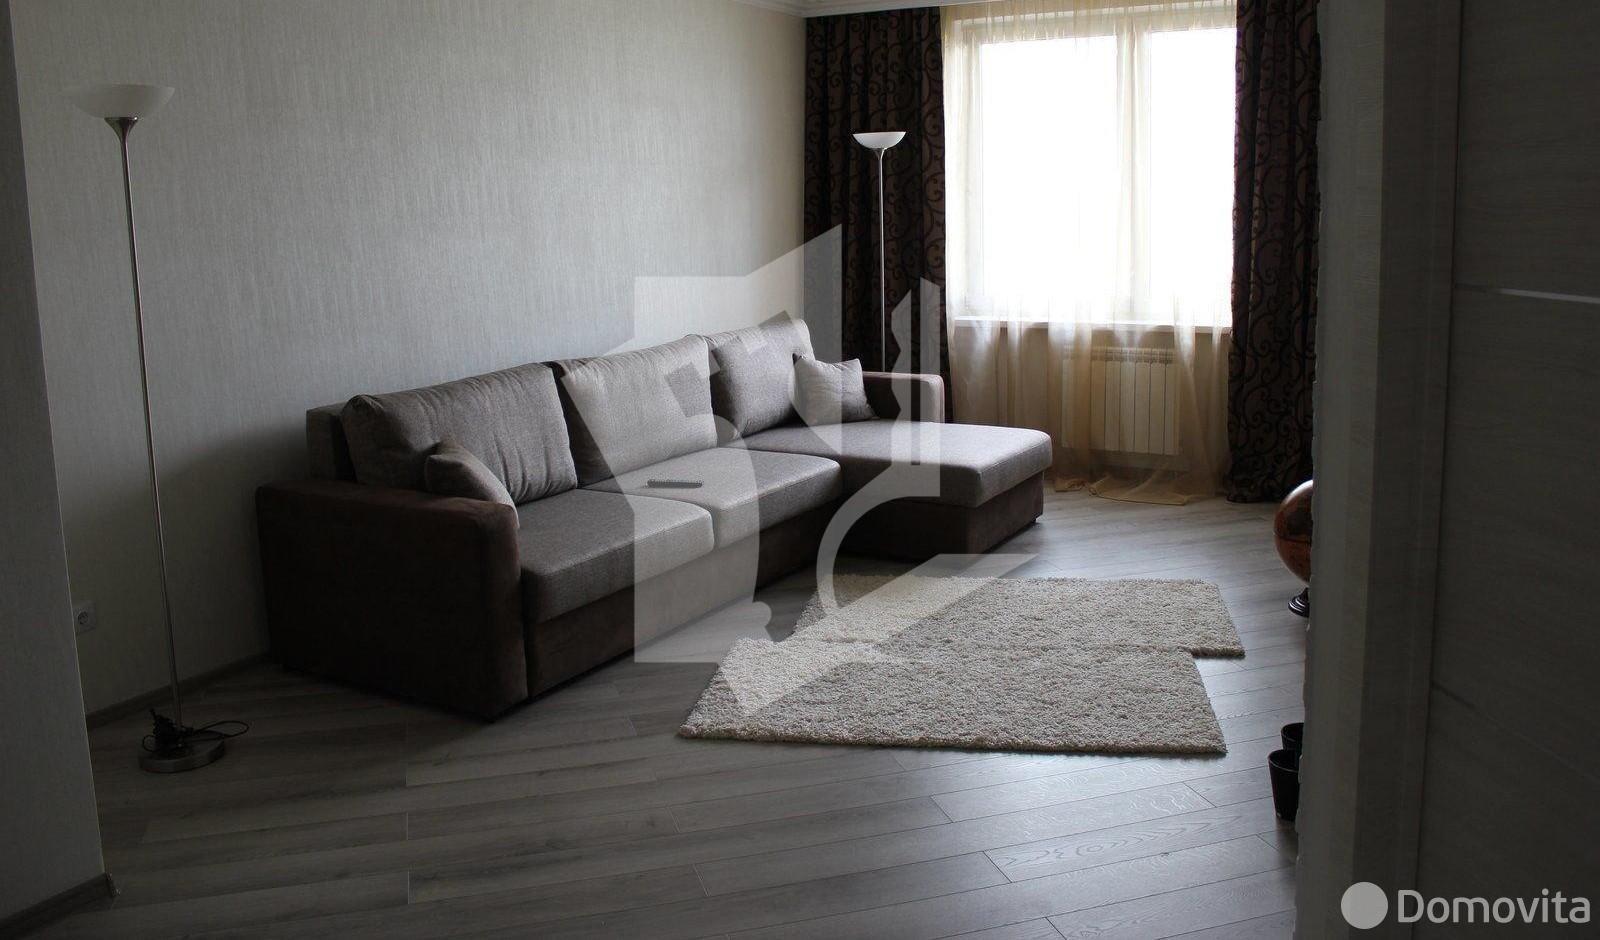 Снять 2-комнатную квартиру в Минске, ул. Скрыганова, д. 4Б - фото 2